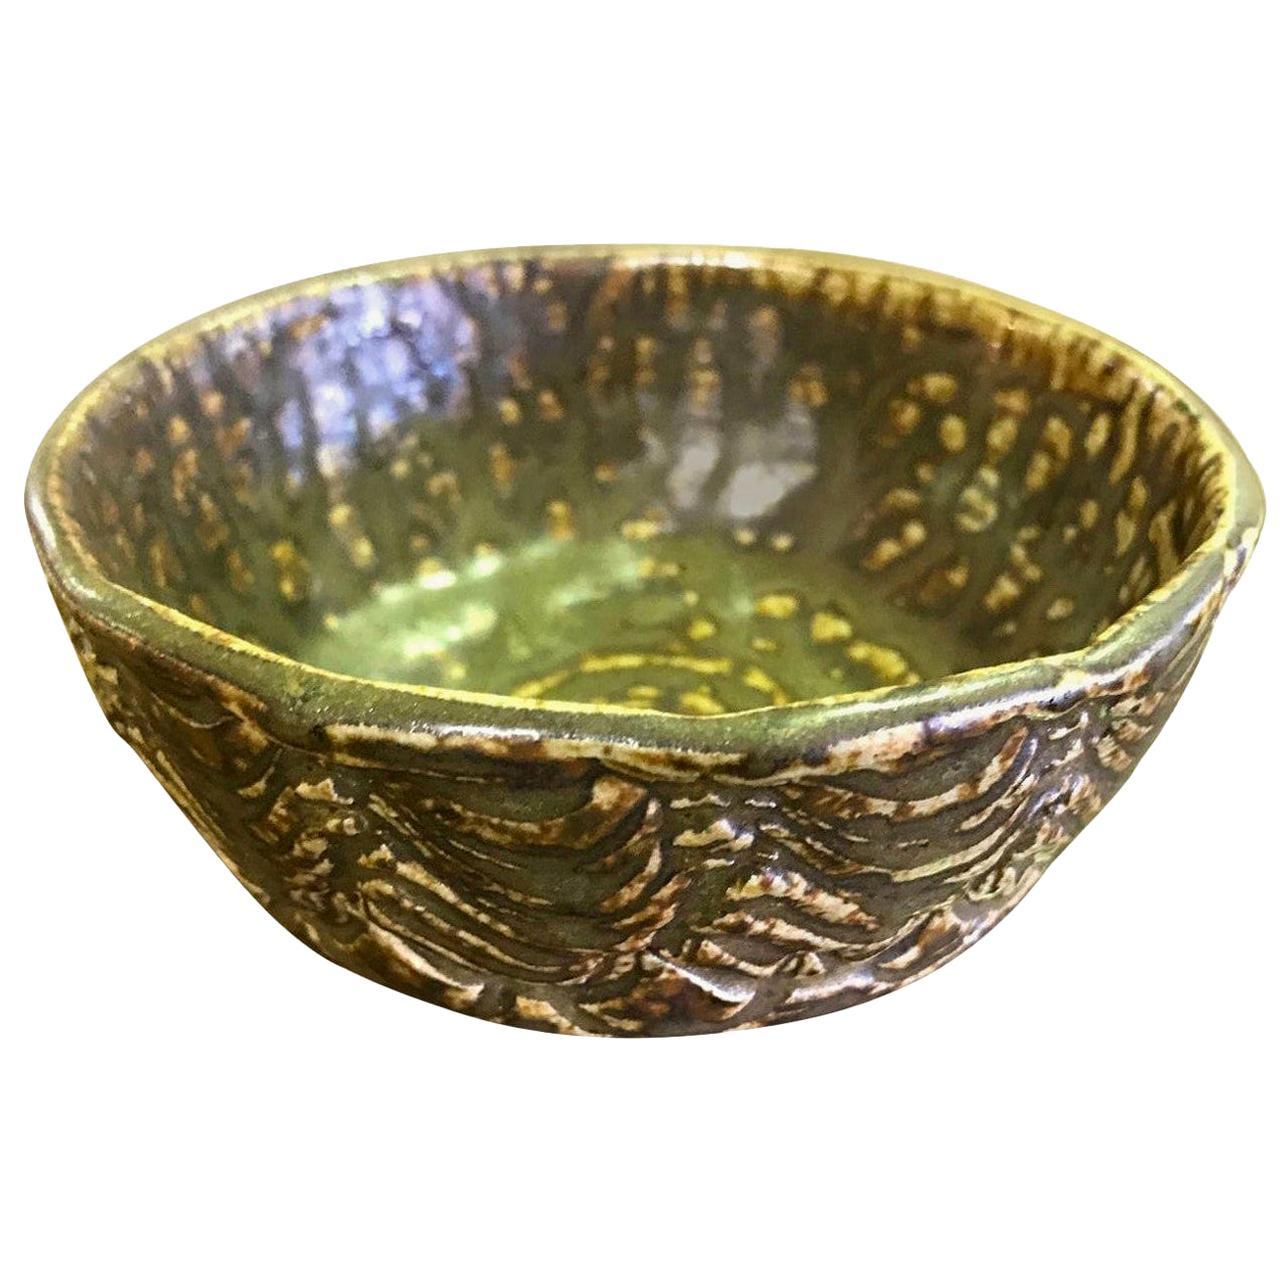 F. Carlton Ball Midcentury Signed Ceramic Pottery Glazed California Studio Bowl